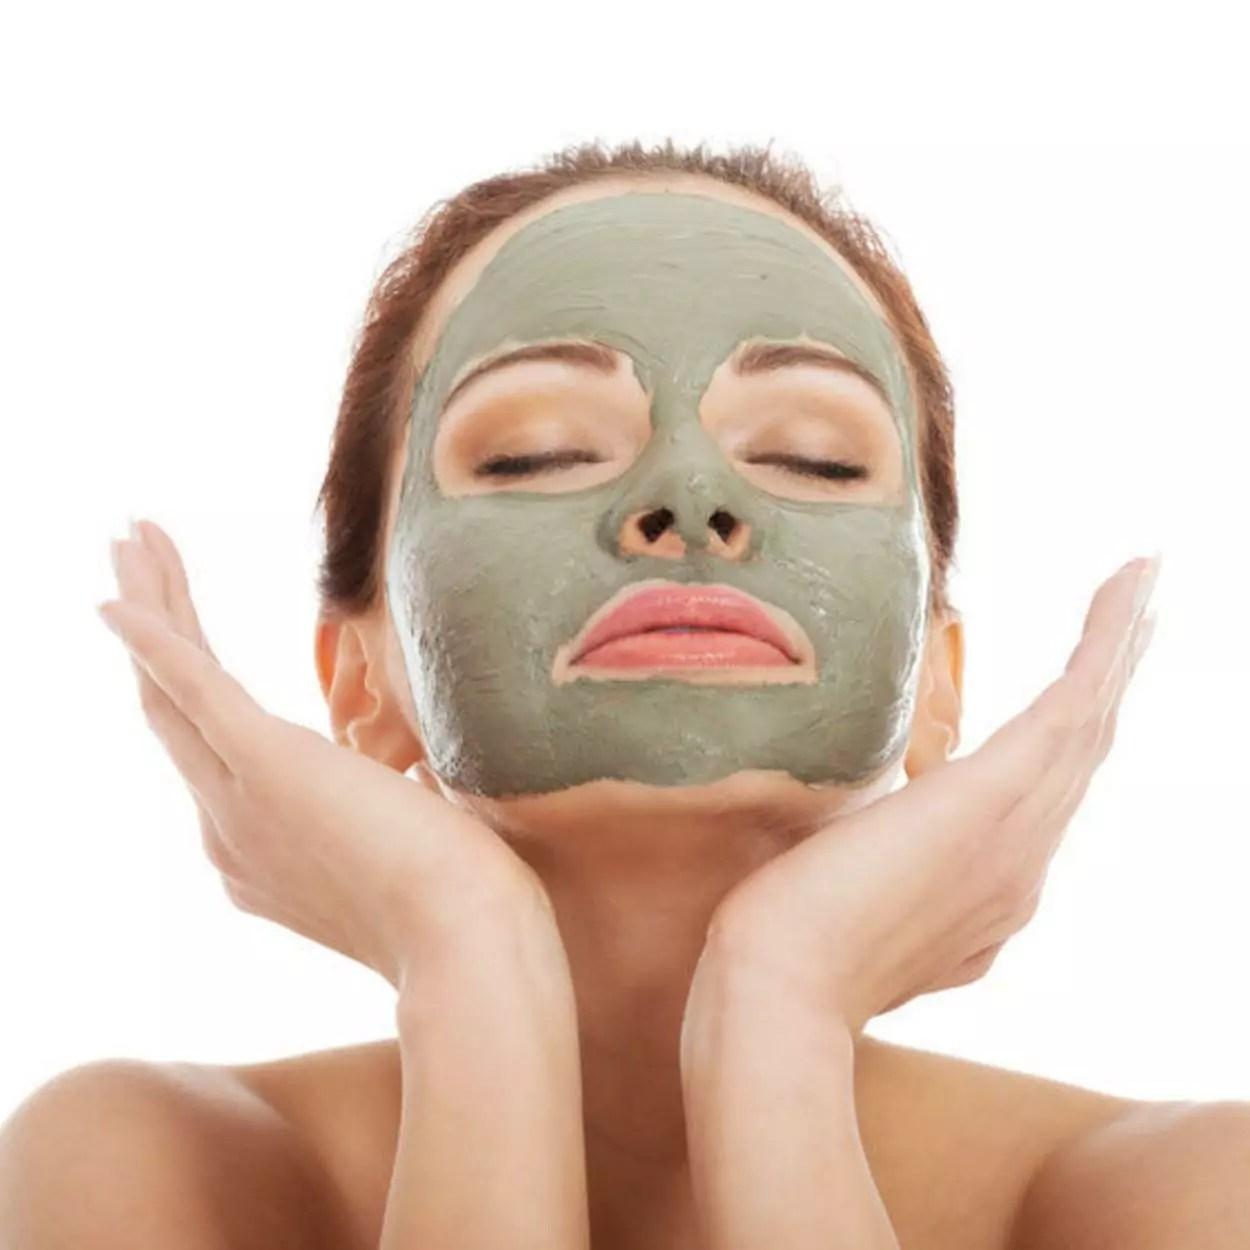 máscaras de argila